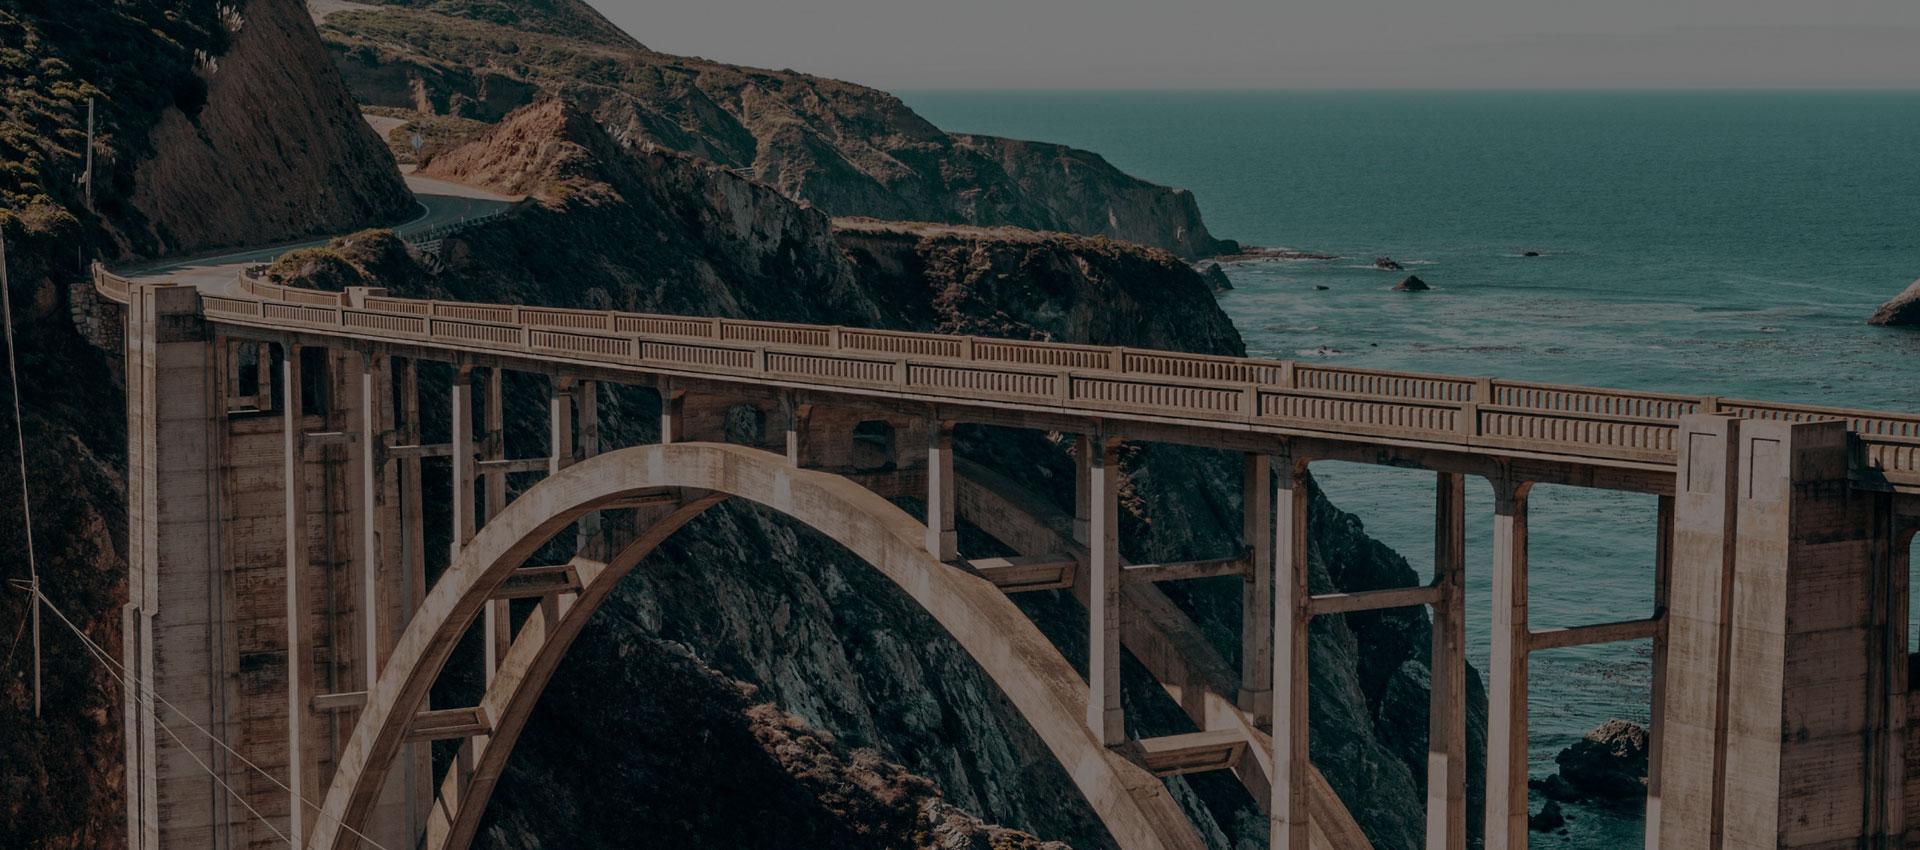 Close Your Bridge Loan In 10 Days*